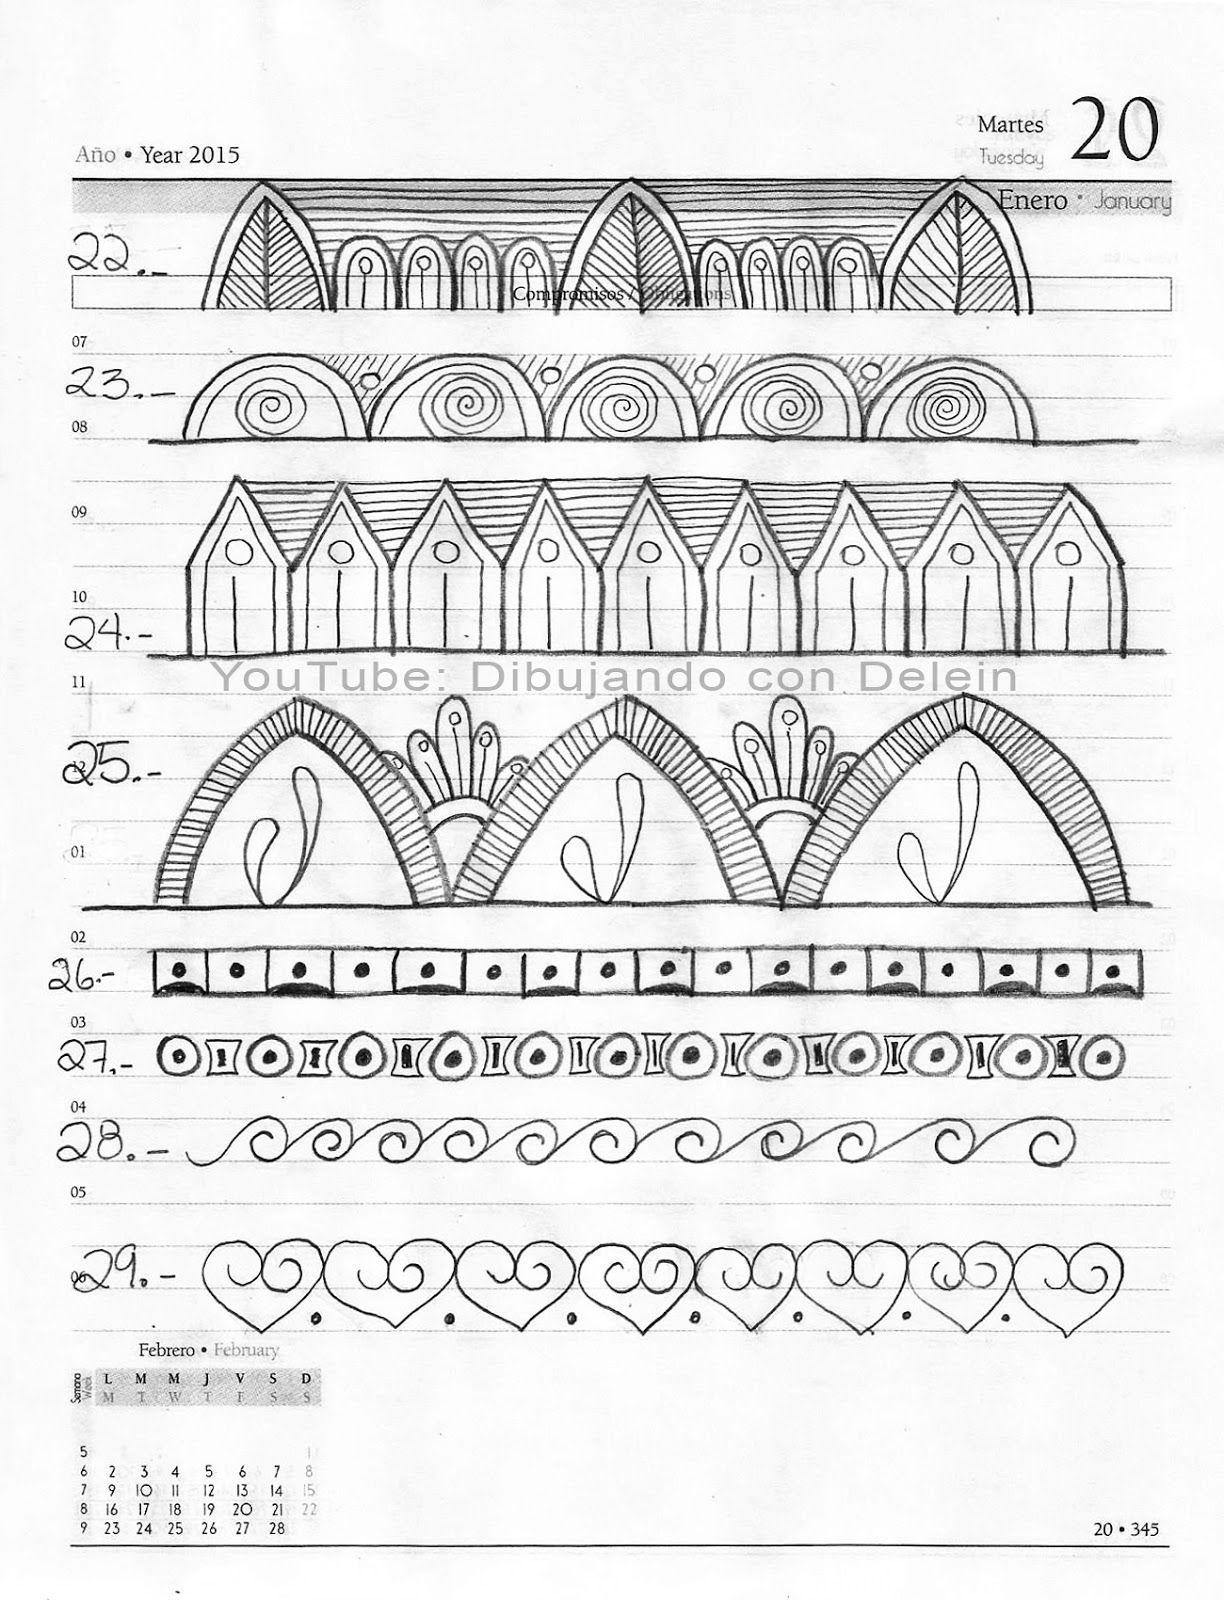 3 de 20 Me auto impuse un reto de 100 lineas para Mandala esta es la hoja 3  de 20, pertenece a la s… | Mandala art, Lección de arte de mandala, Dibujos  con mandalas